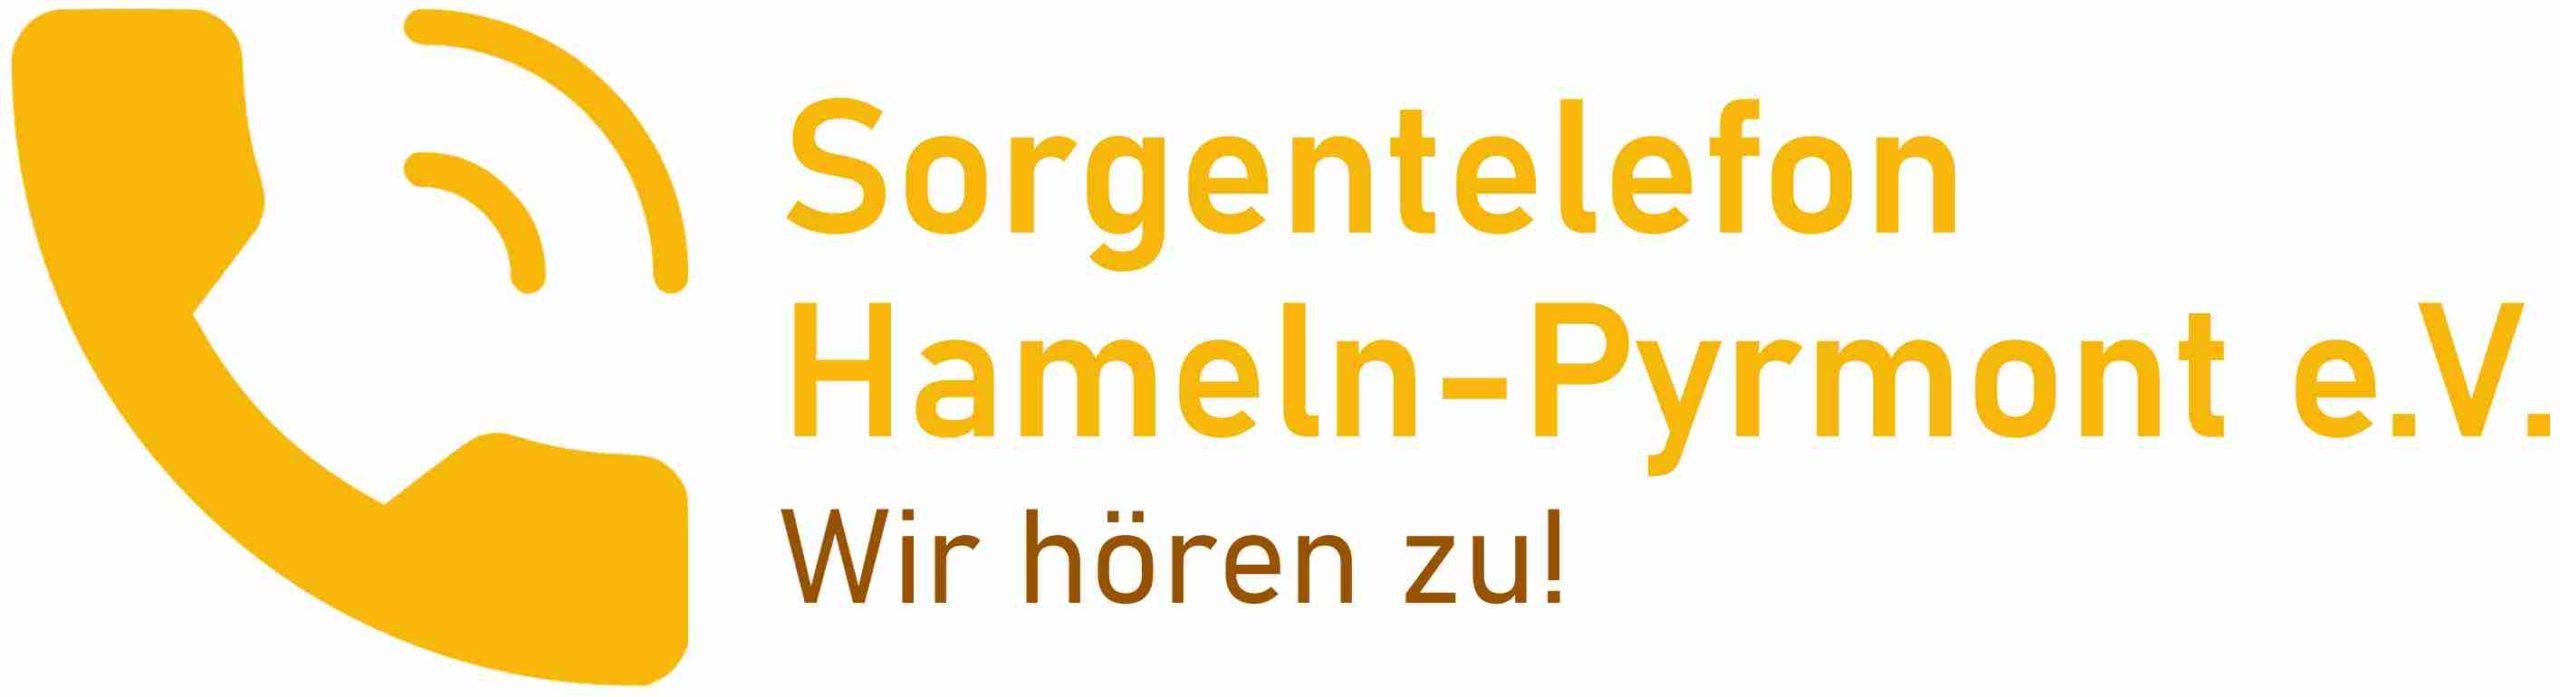 Sorgentelefon Hameln-Pyrmont e.V.